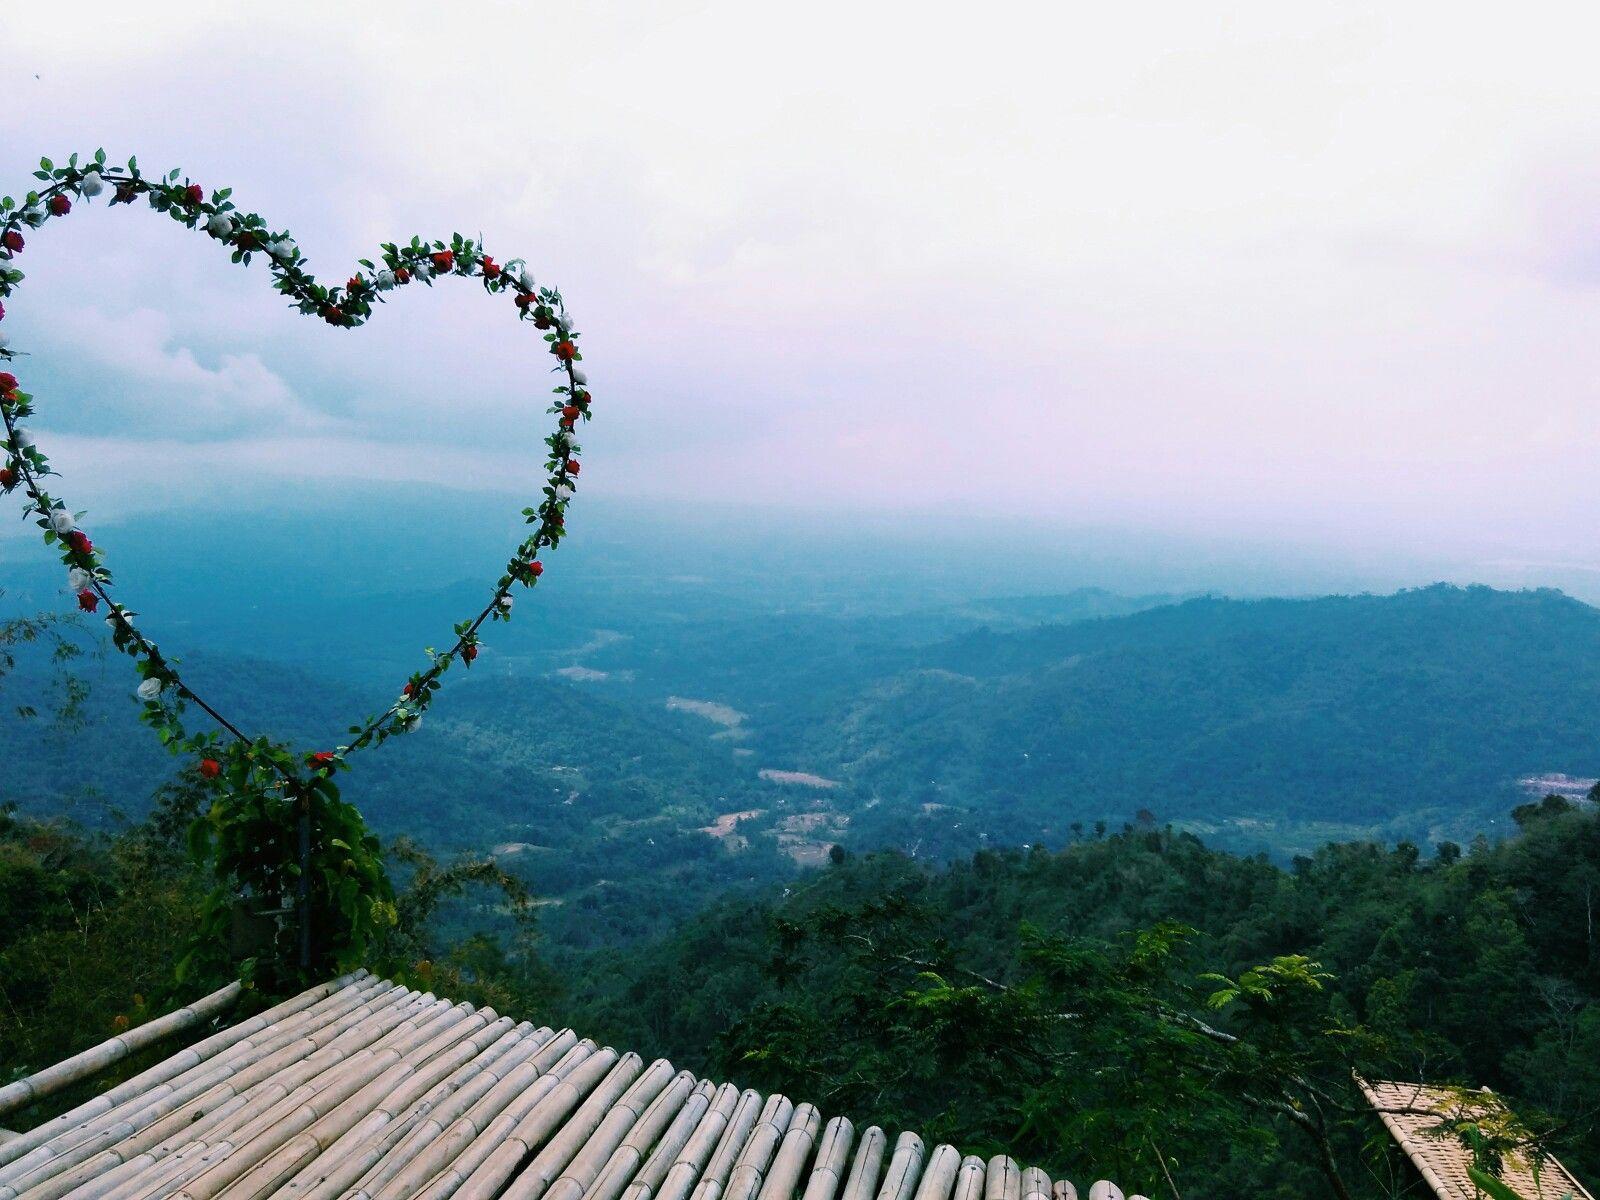 Kebun Teh Nglinggo Samigaluh Kulon Progo Yogyakarta Indonesia Kota